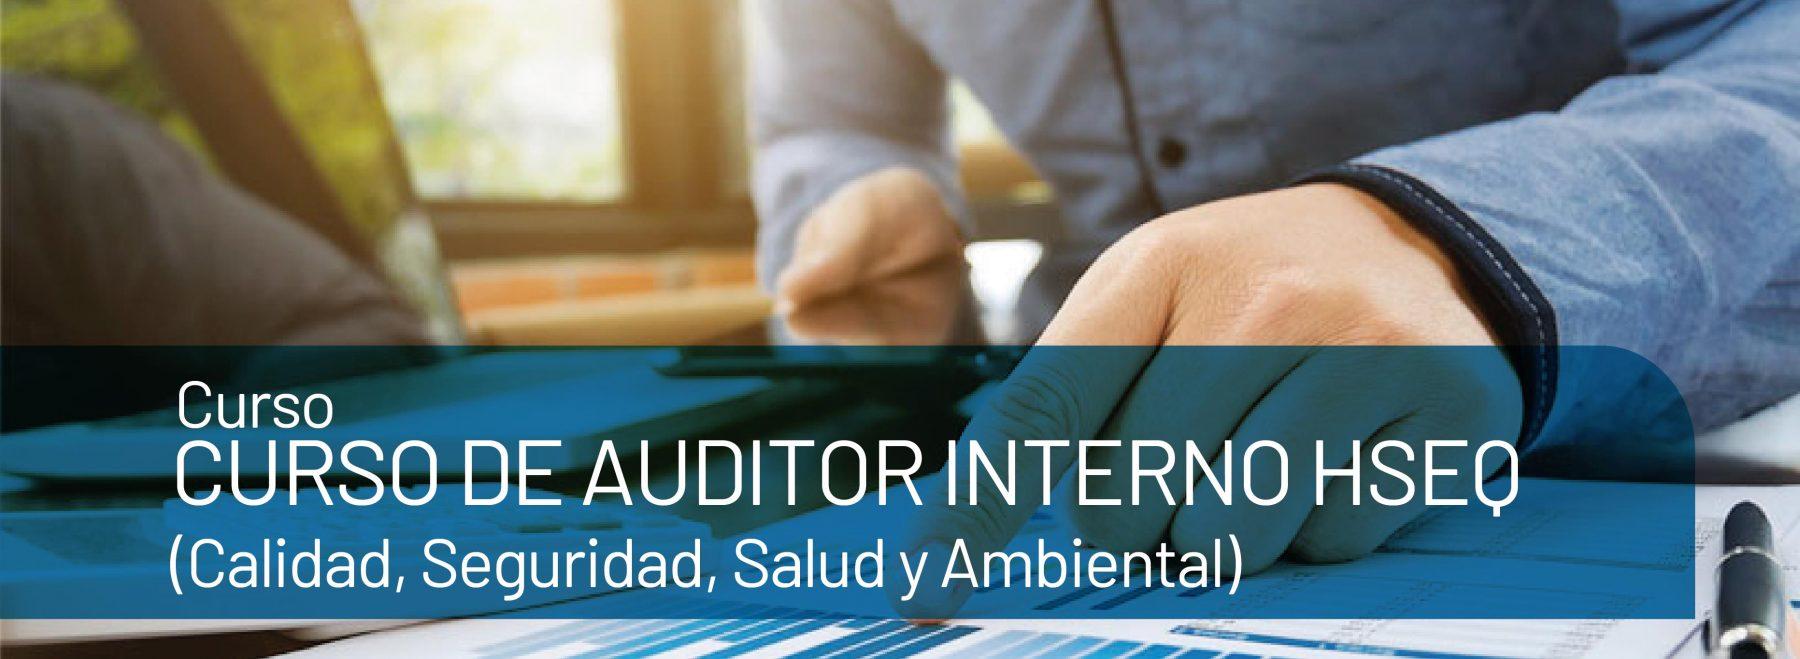 Curso de auditor interno HSEQ